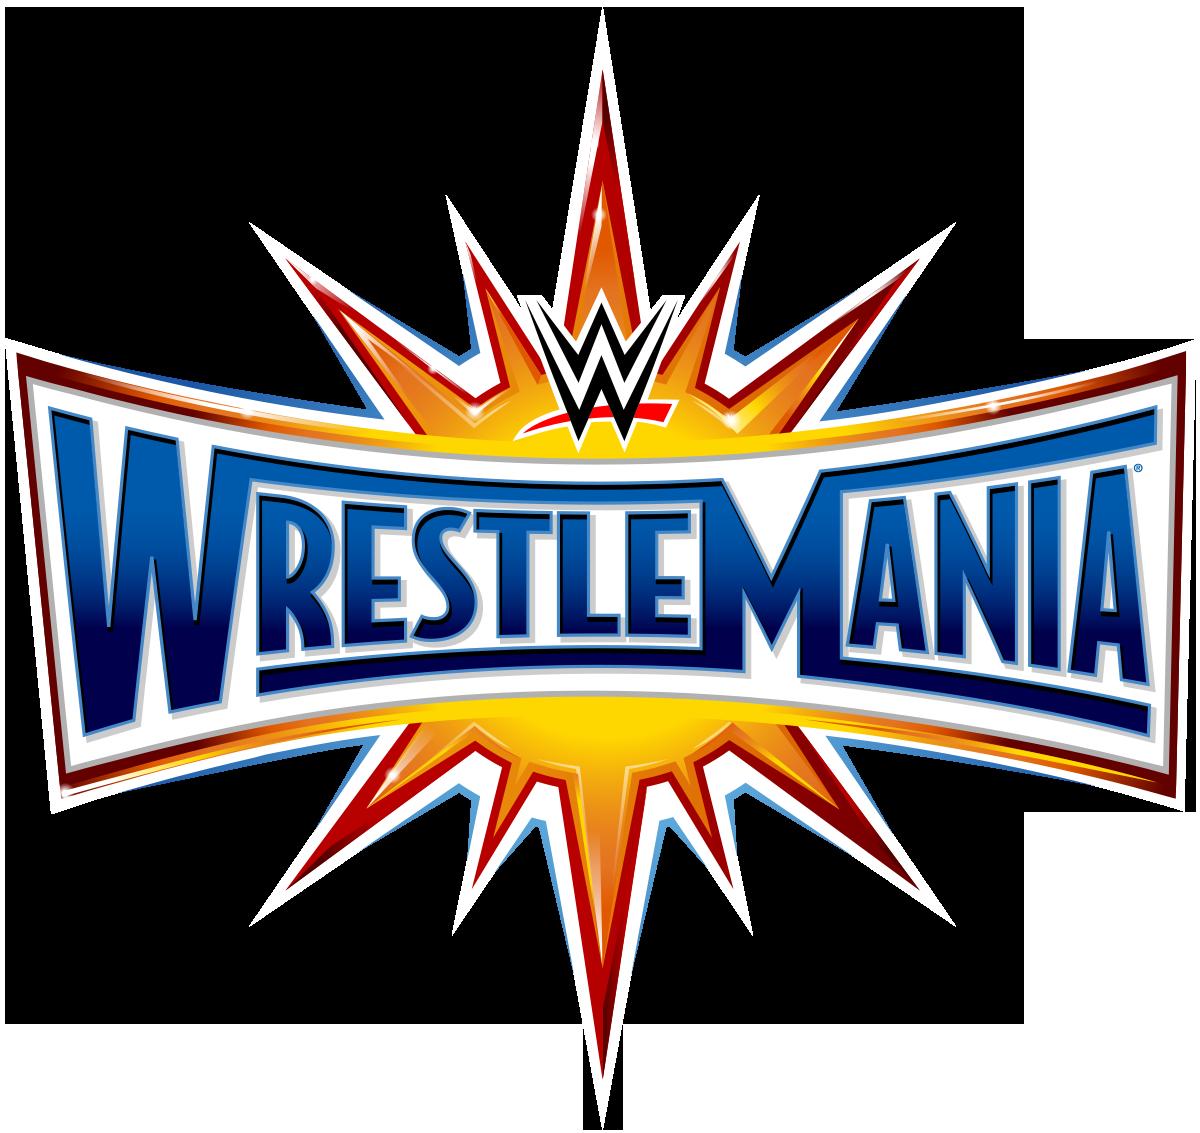 The Updated Wrestlemania 33 Match Card Wrestlemania 33 Wrestlemania Wwe Logo